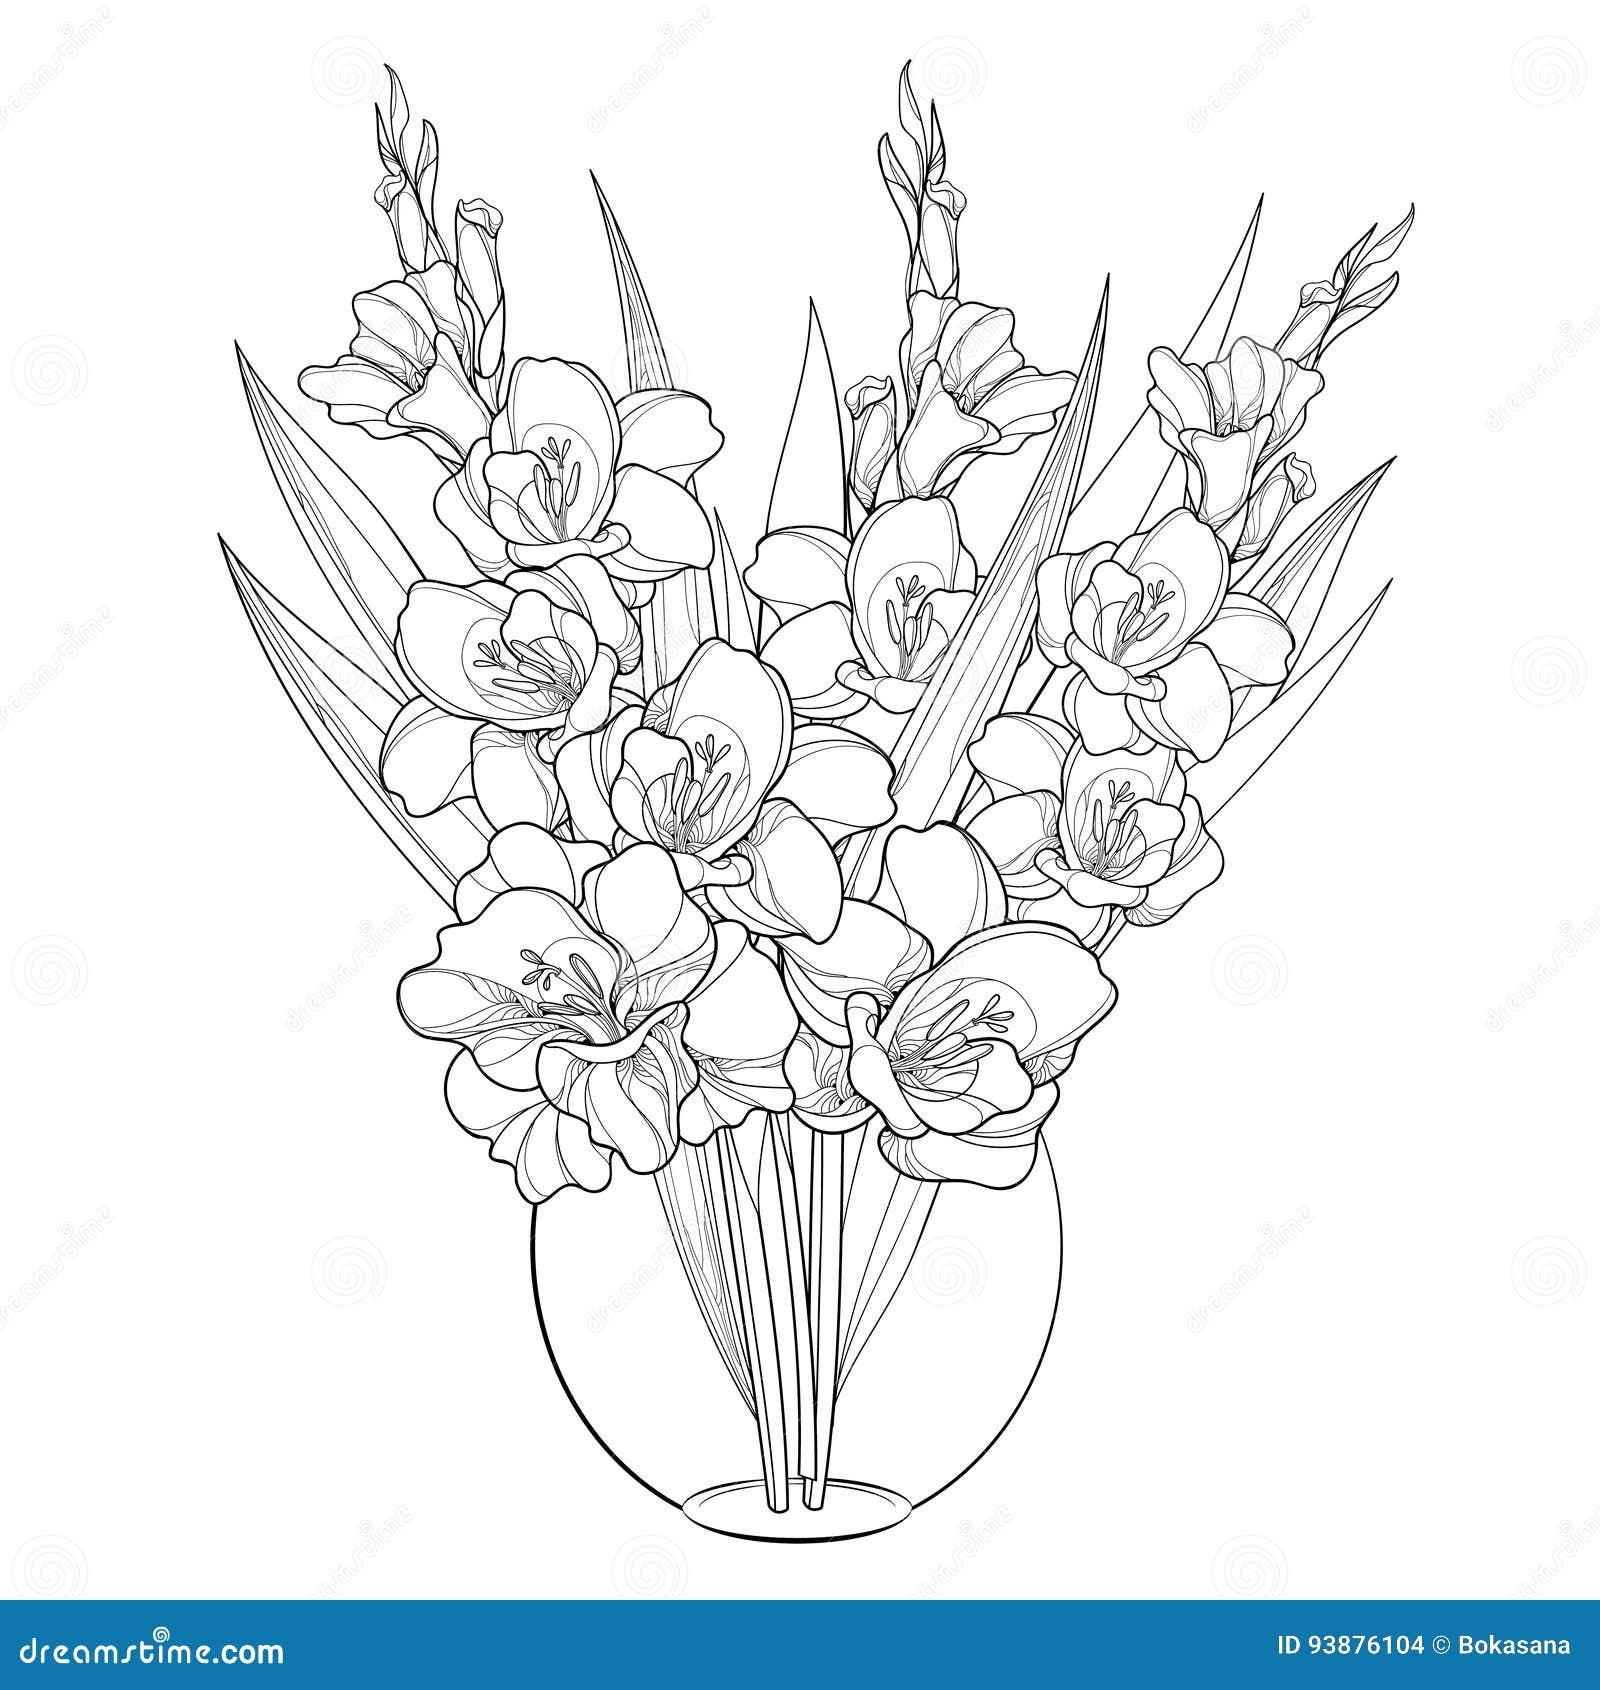 Gladiolus cartoons illustrations vector stock images for Bouquet de lys